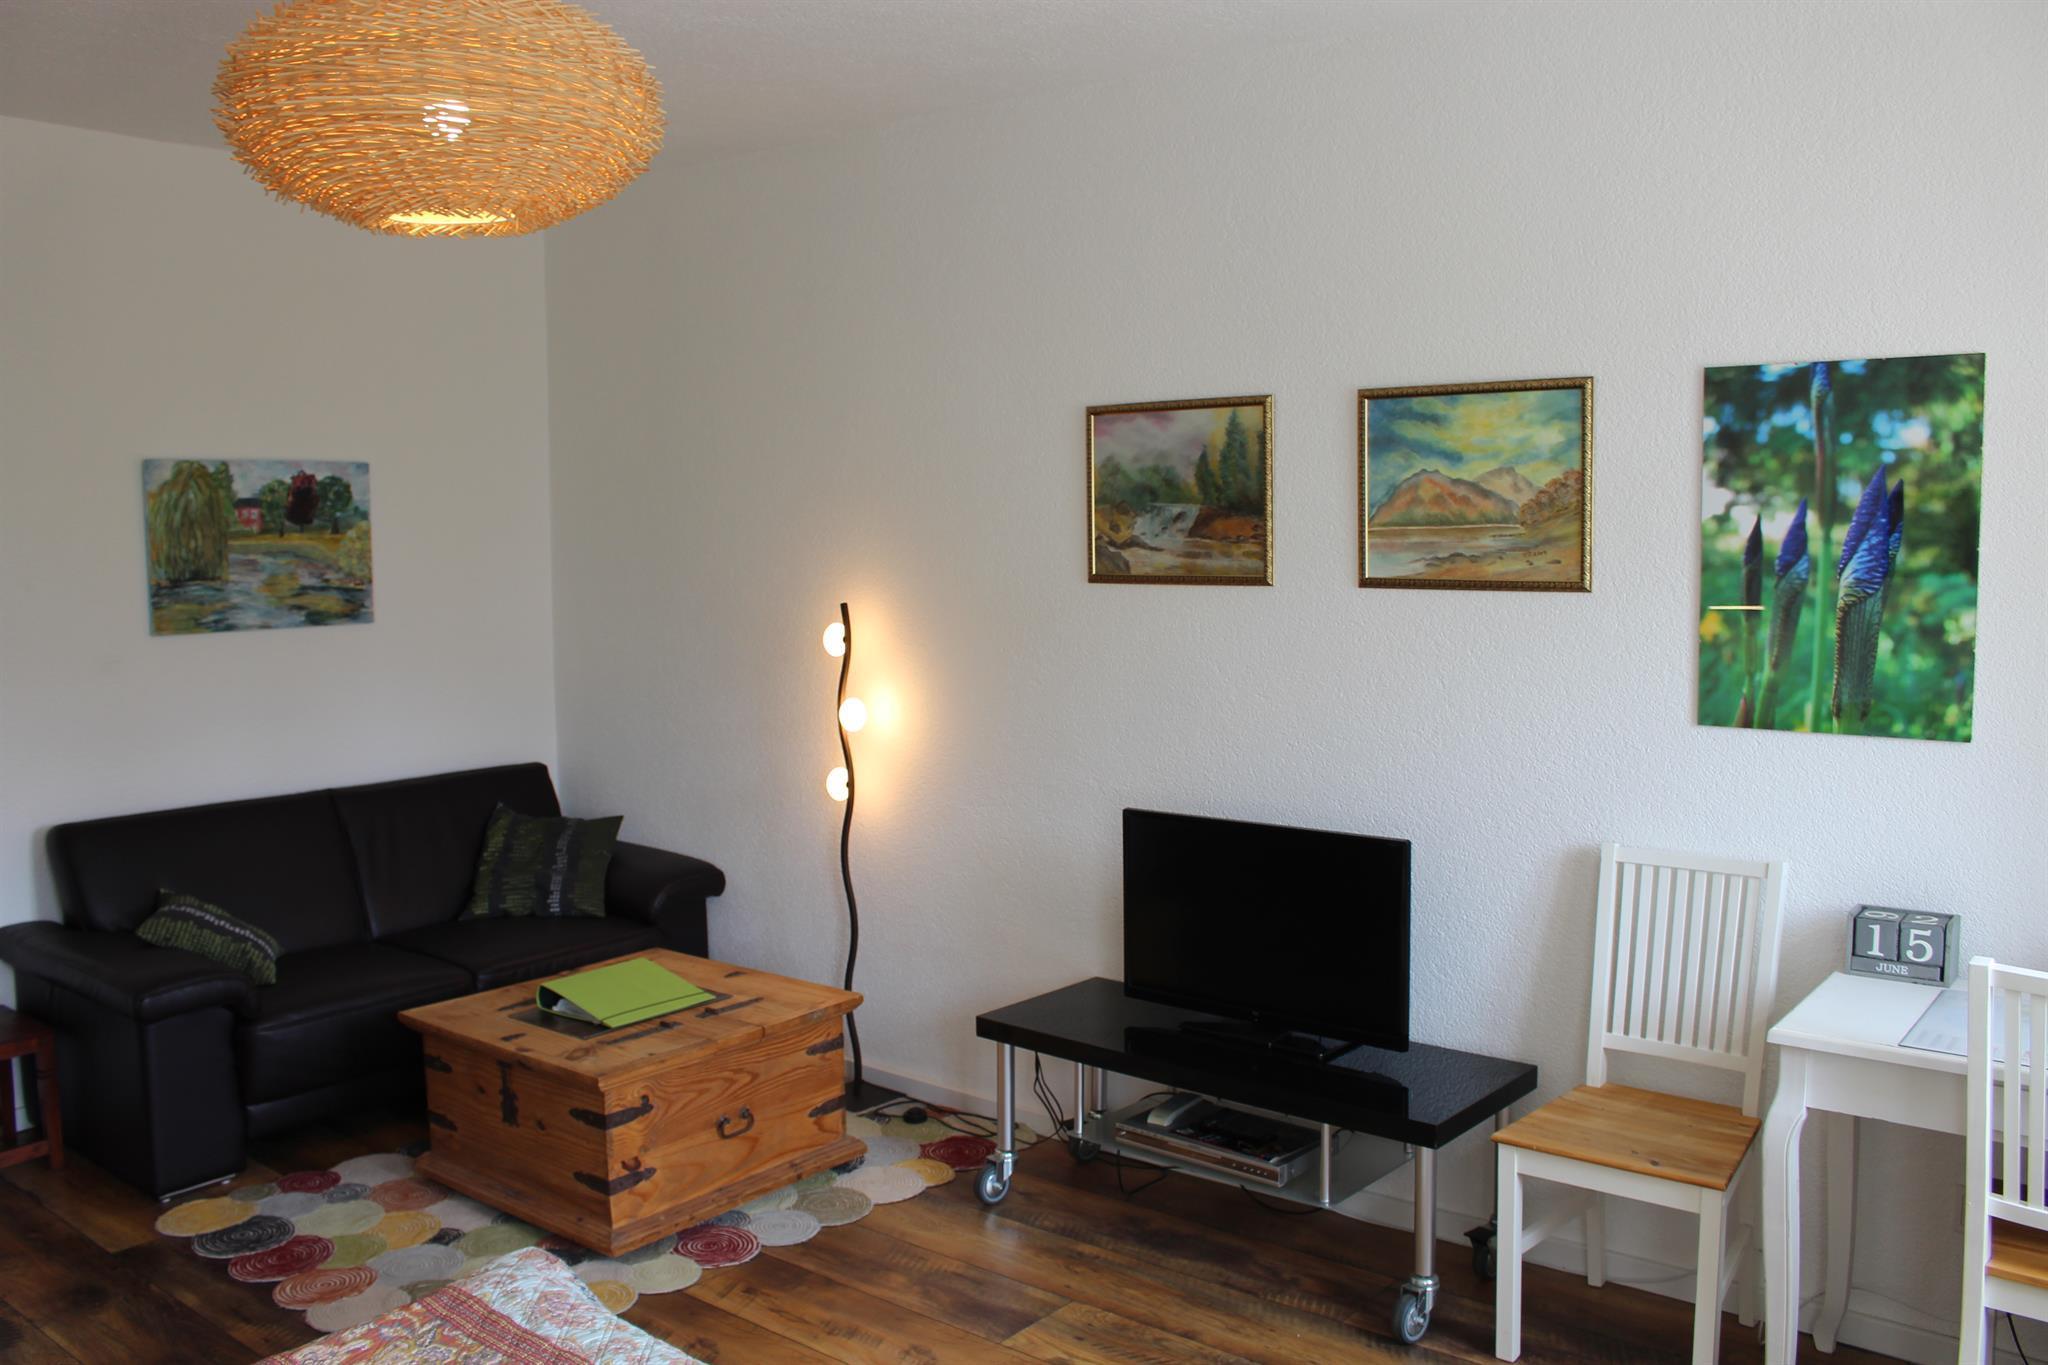 gastehaus neumuhle mandelbachtal mandelbachtal ormesheim meuble pension pension sans restaurant hotel